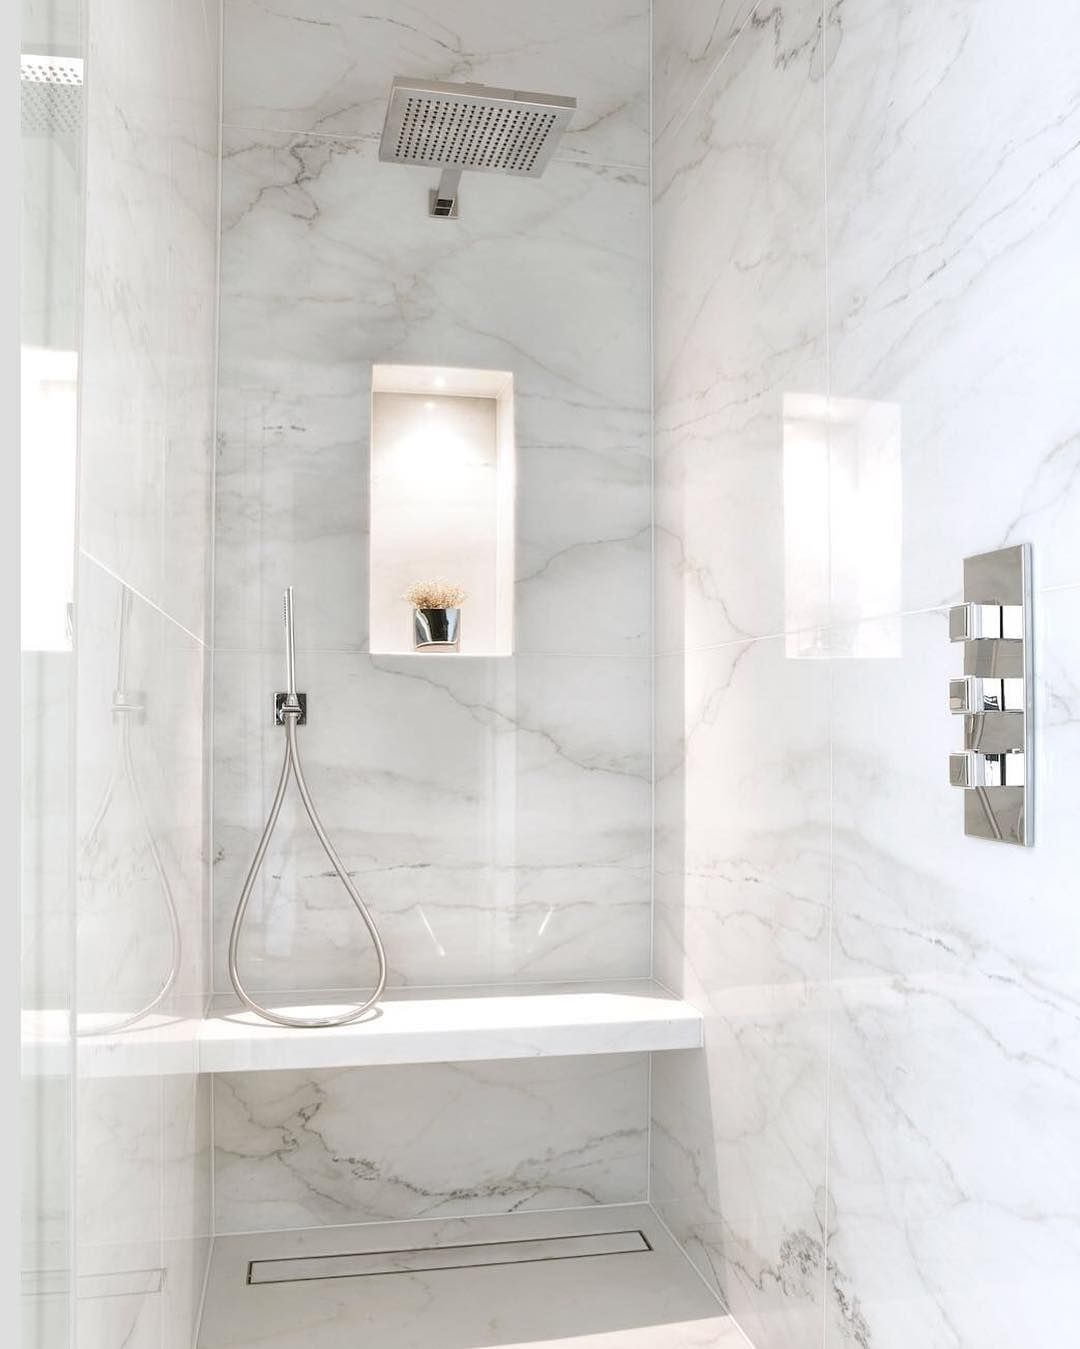 Clean Marble Bathroom Bathroom Design Luxury White Marble Bathrooms Modern Luxury Bathroom